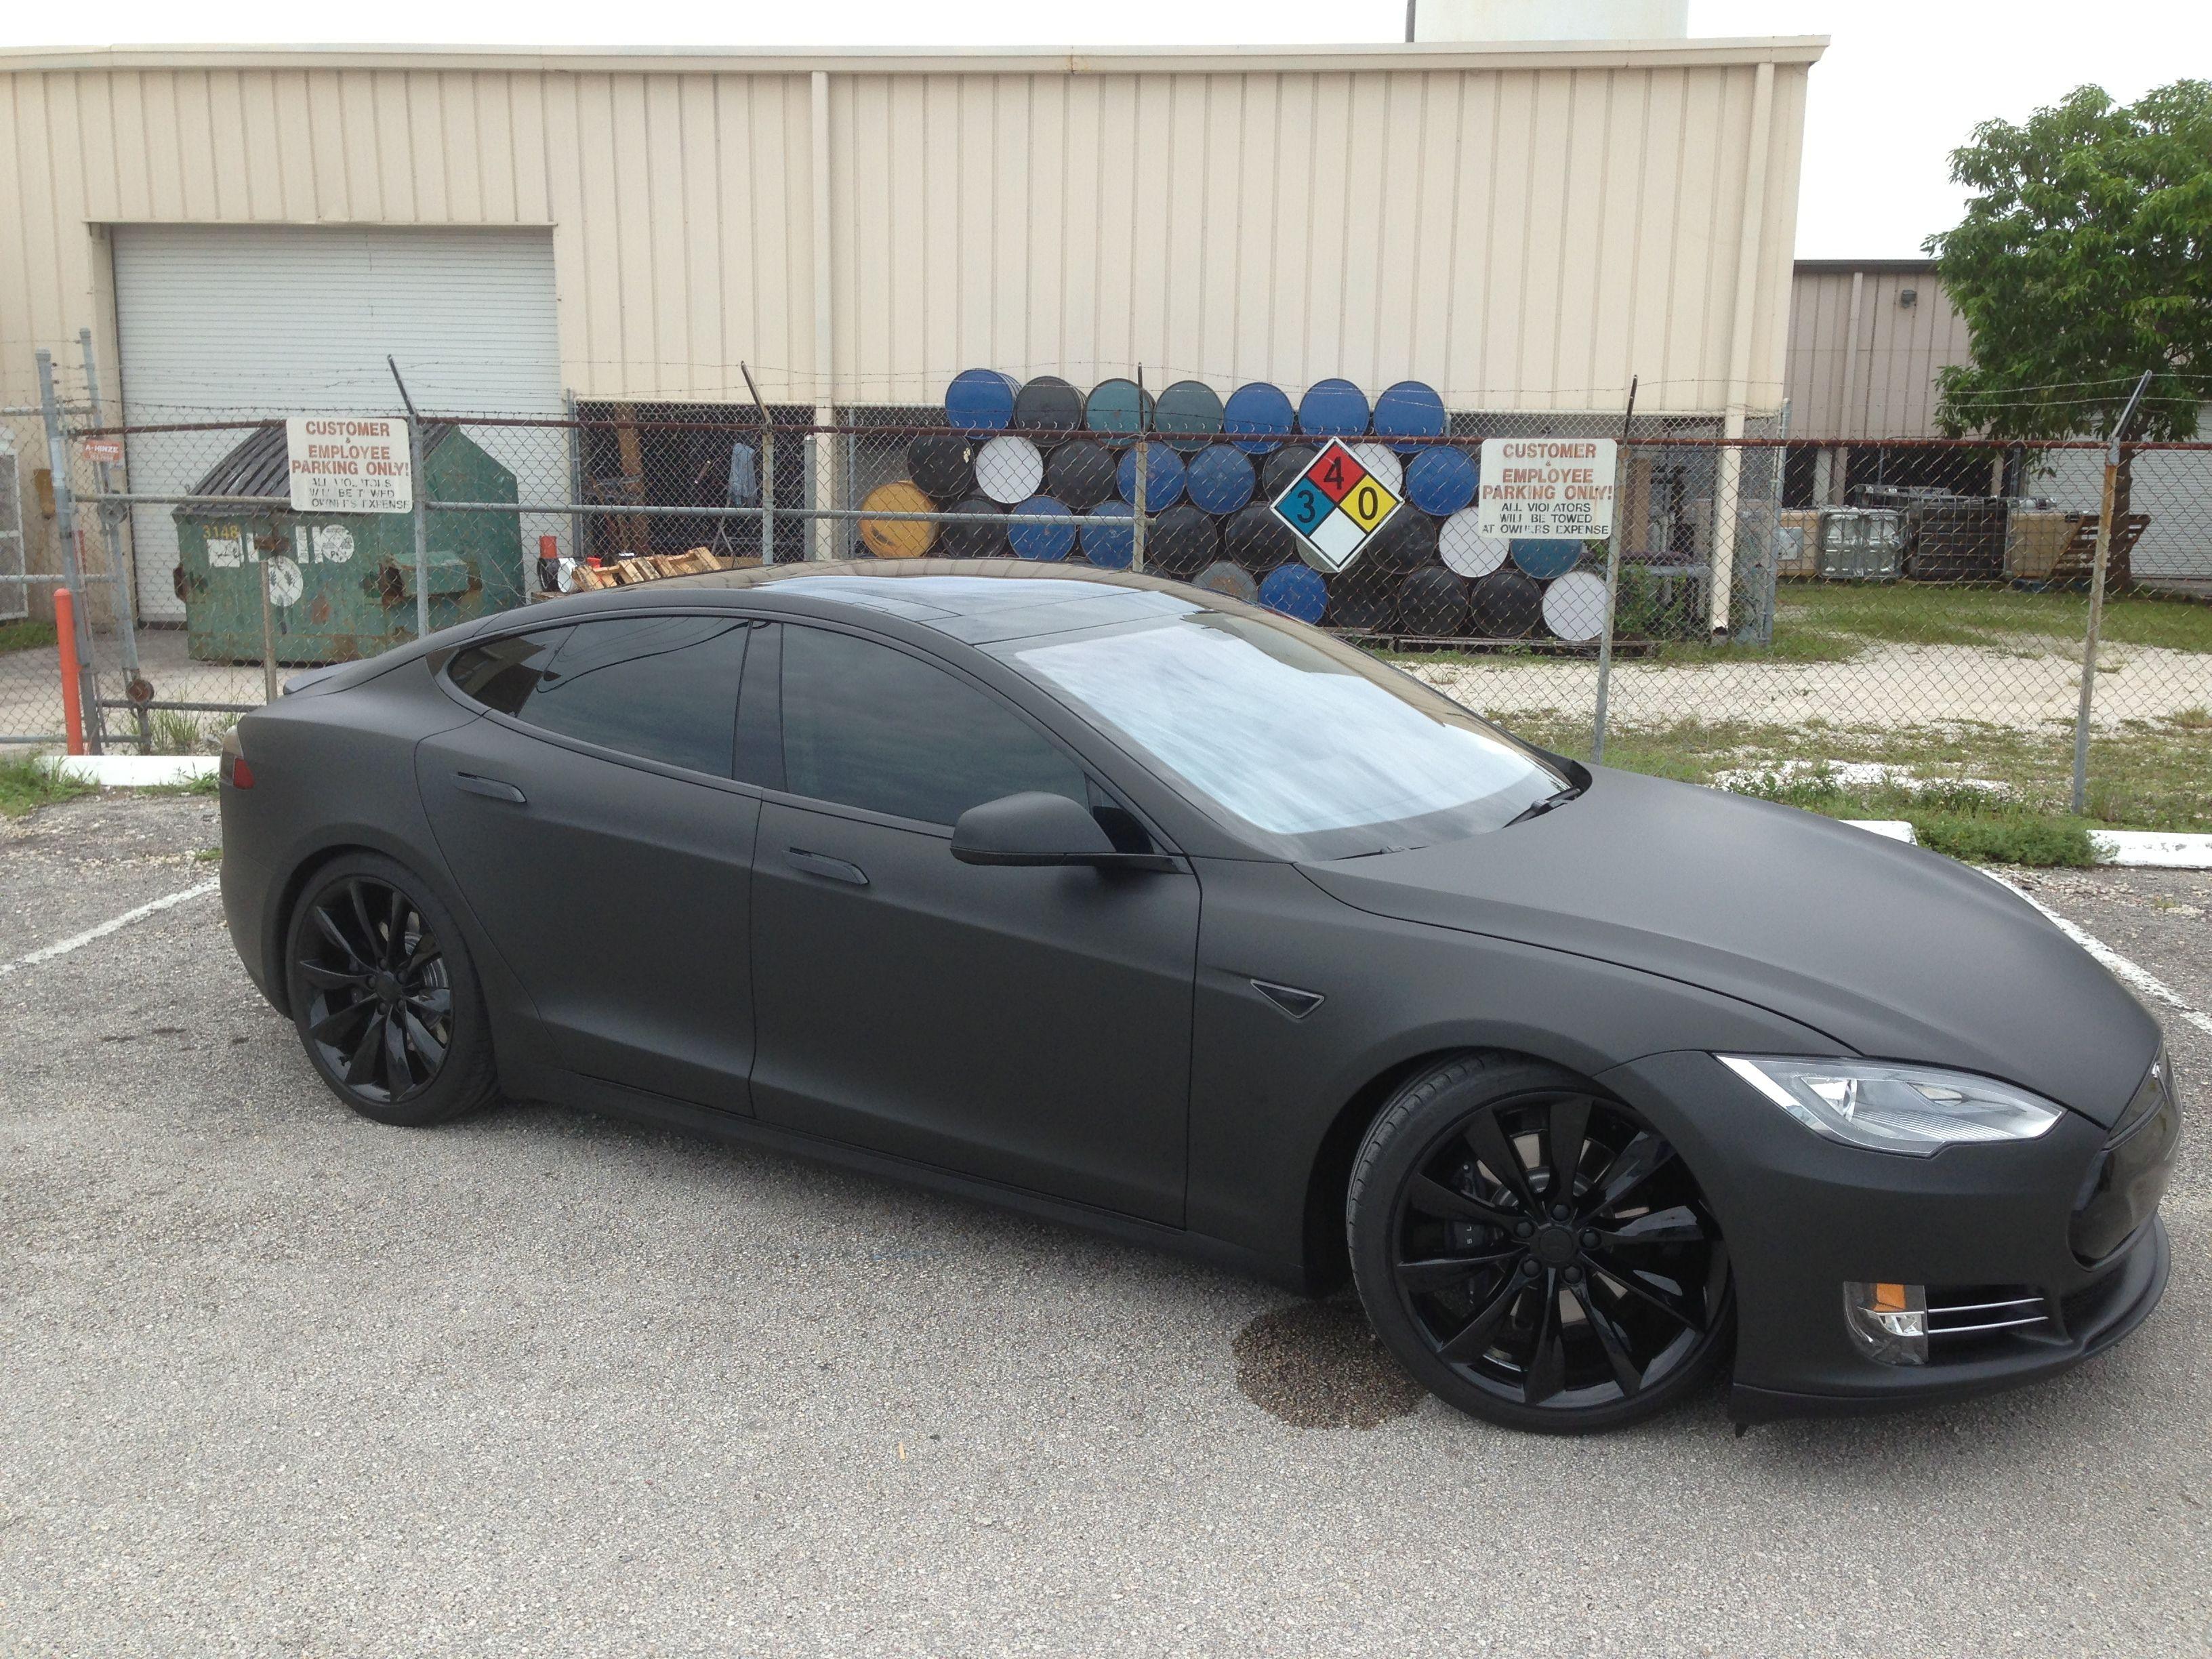 Tesla model s full matte black wrap automobiles pinterest matte black wraps and models